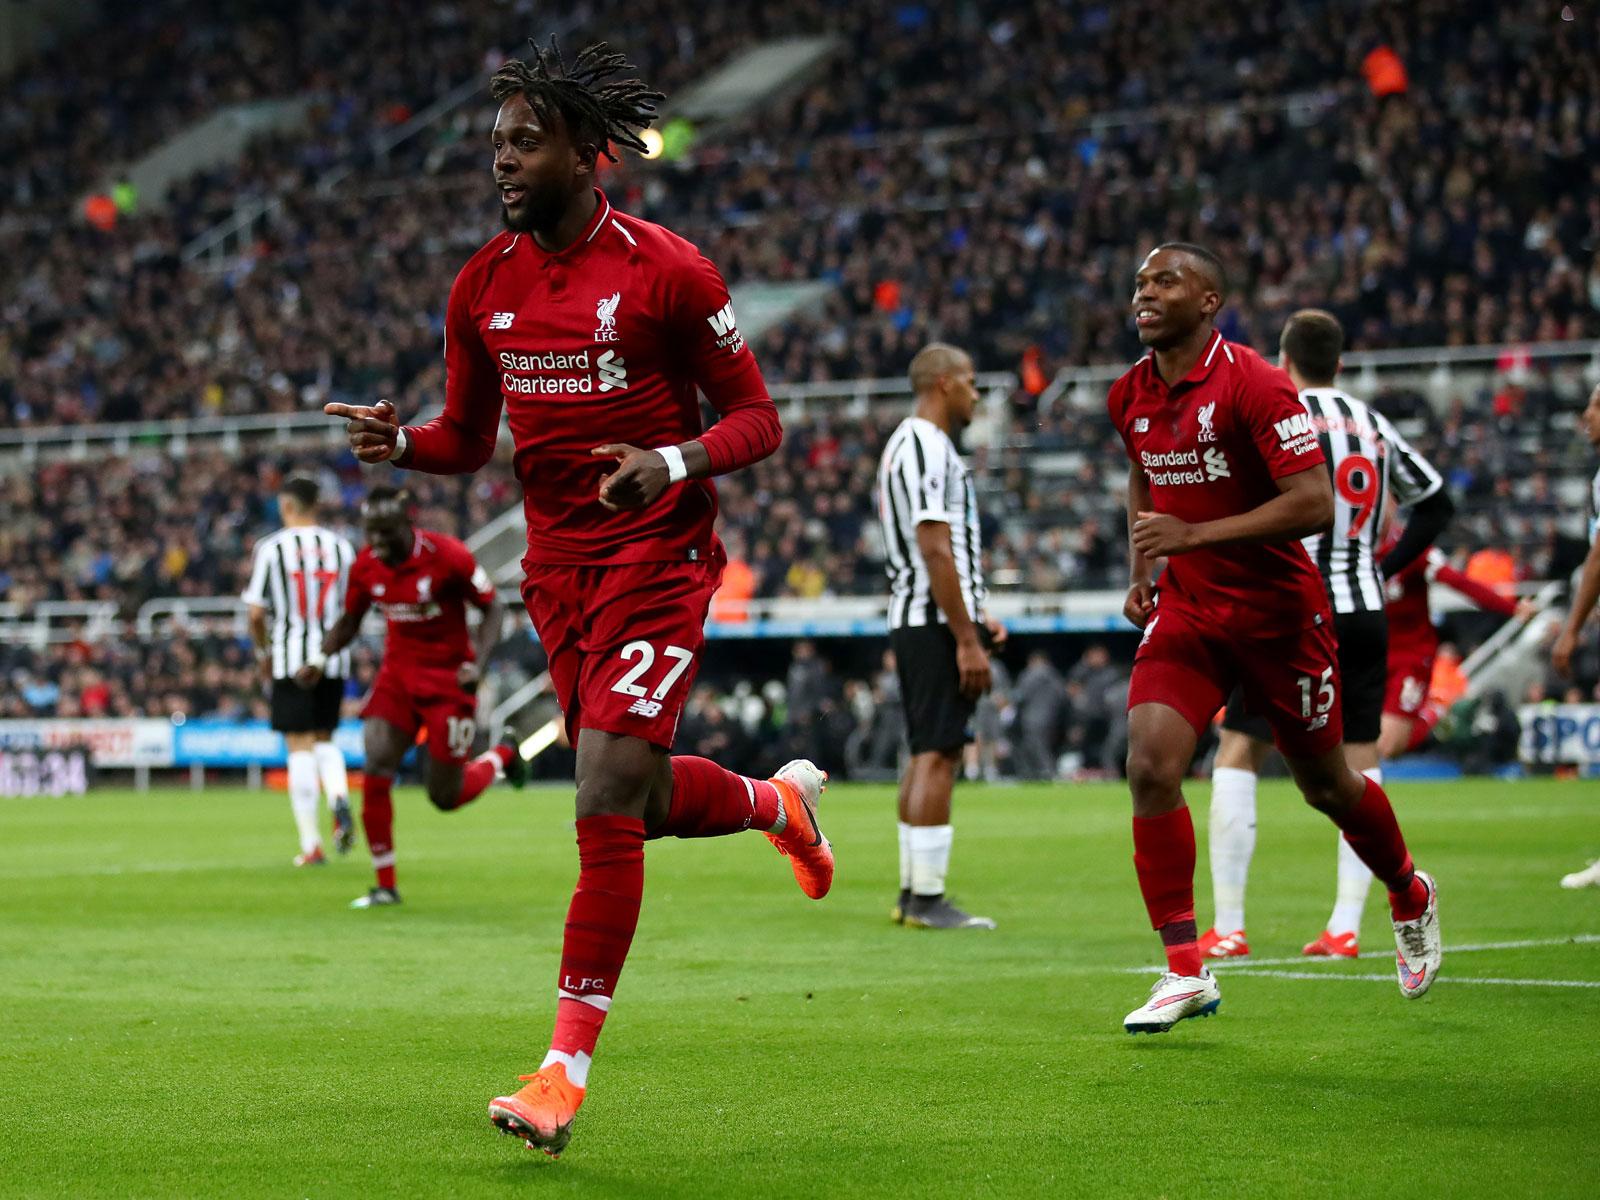 Divock Origi scores for Liverpool vs. Newcastle